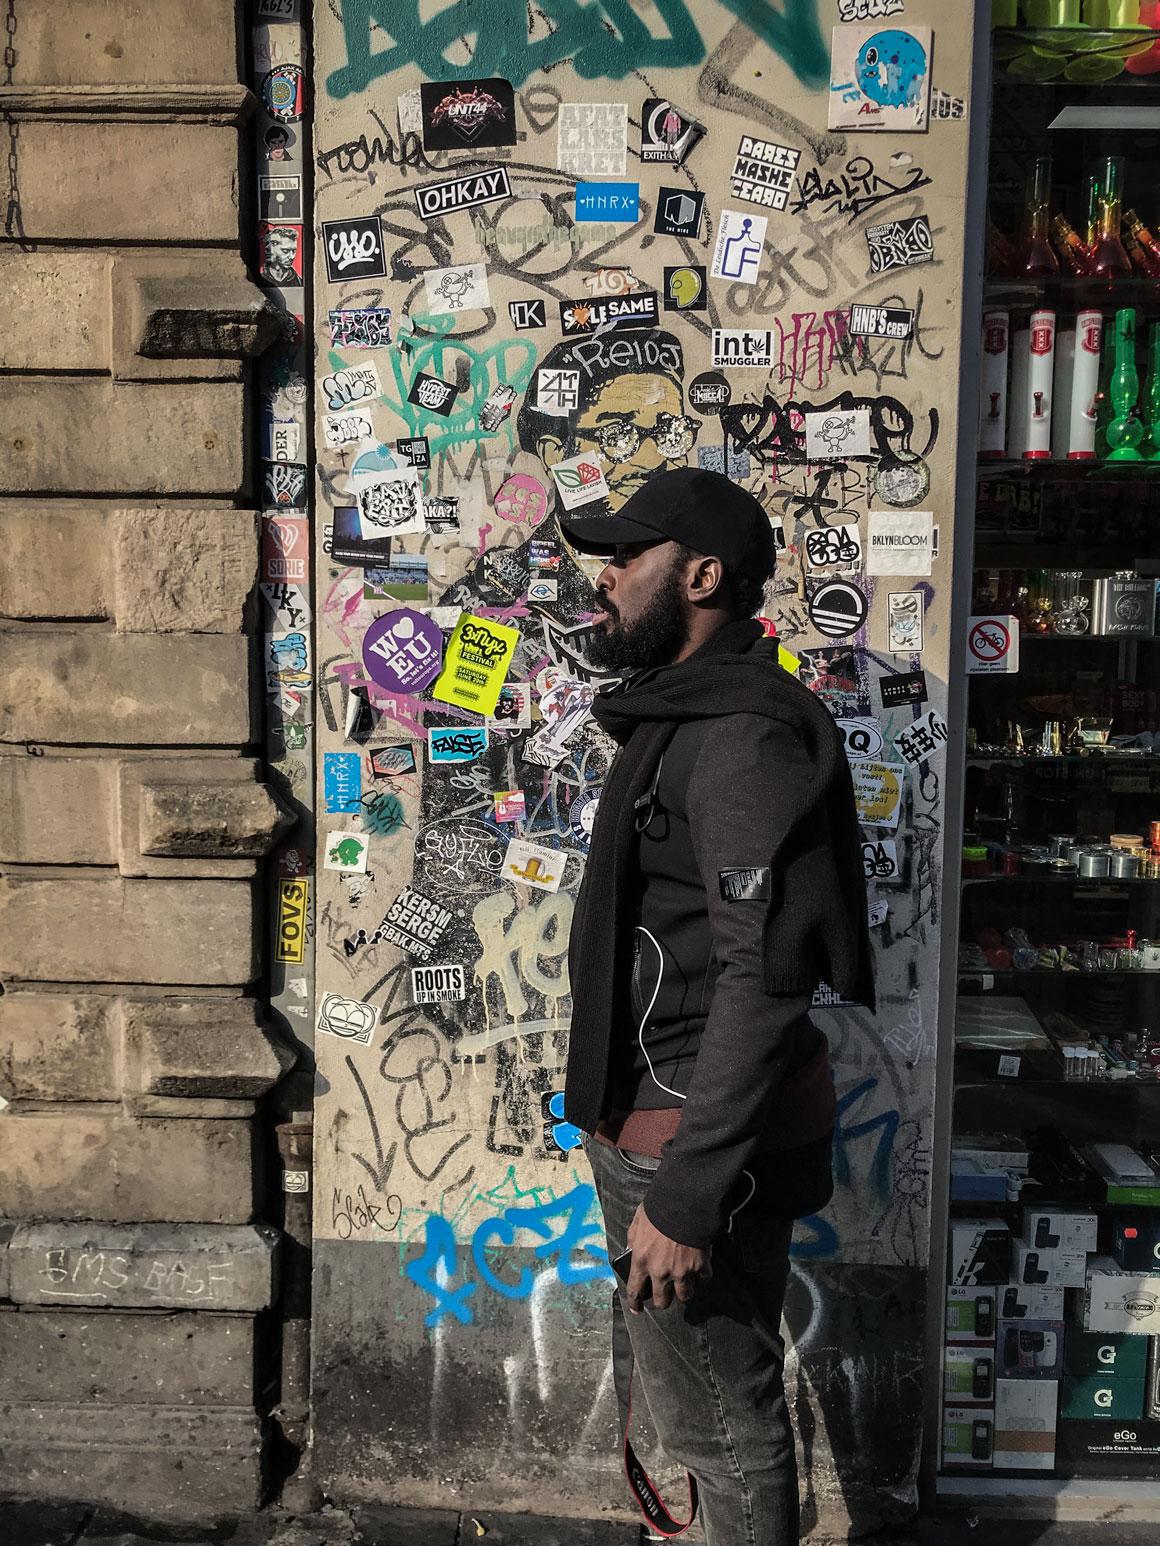 Stephane K, mur d'autocollants, Amsterdam